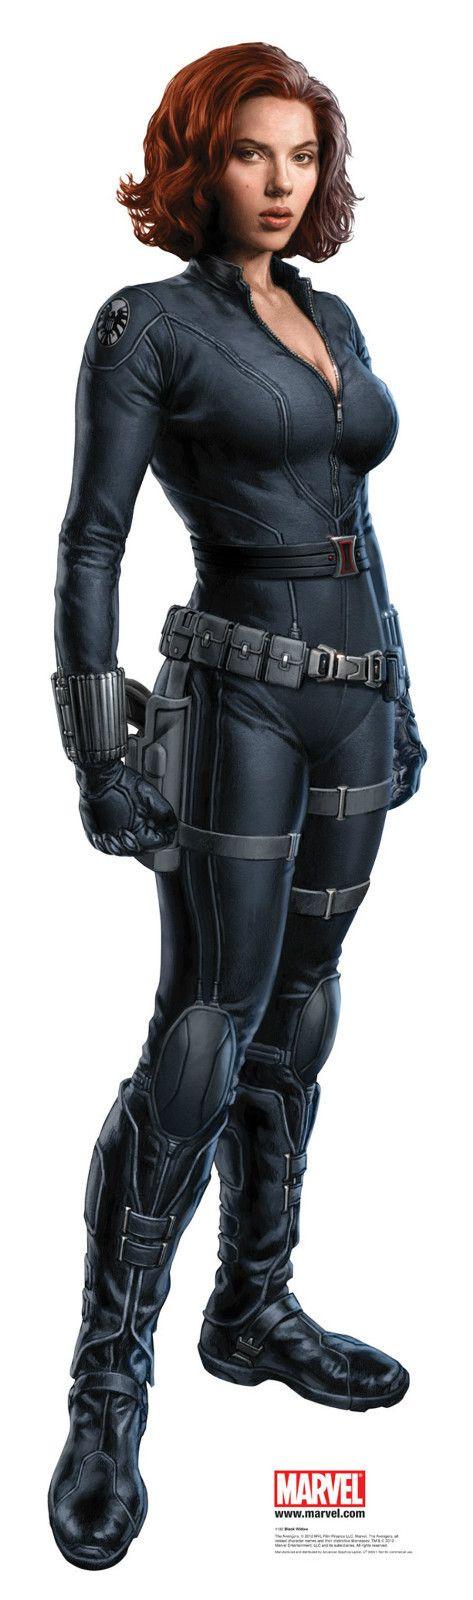 Los Vengadores: la Viuda Negra / The Avengers: The Black Widow